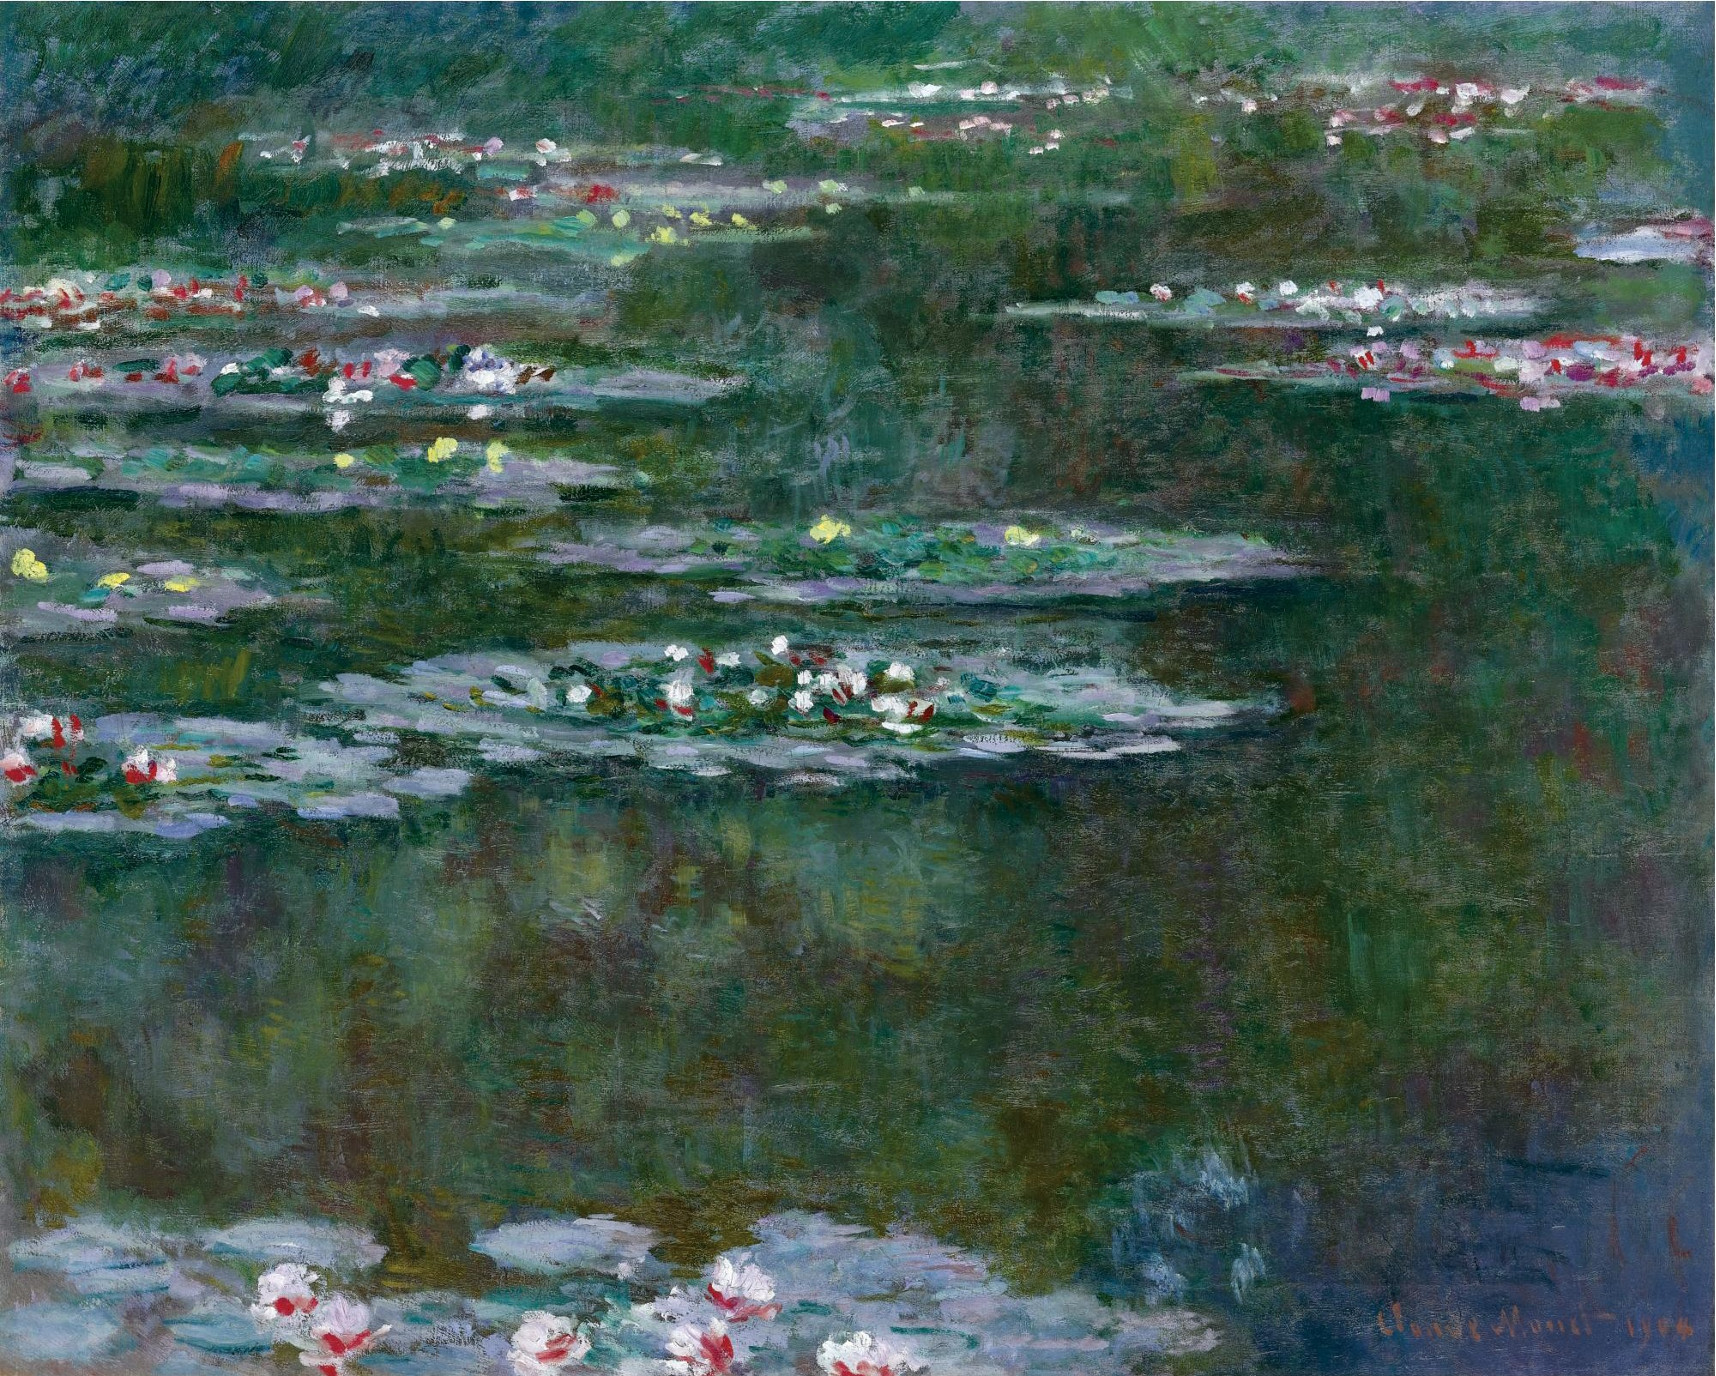 C.Monet, Ninfee 1904